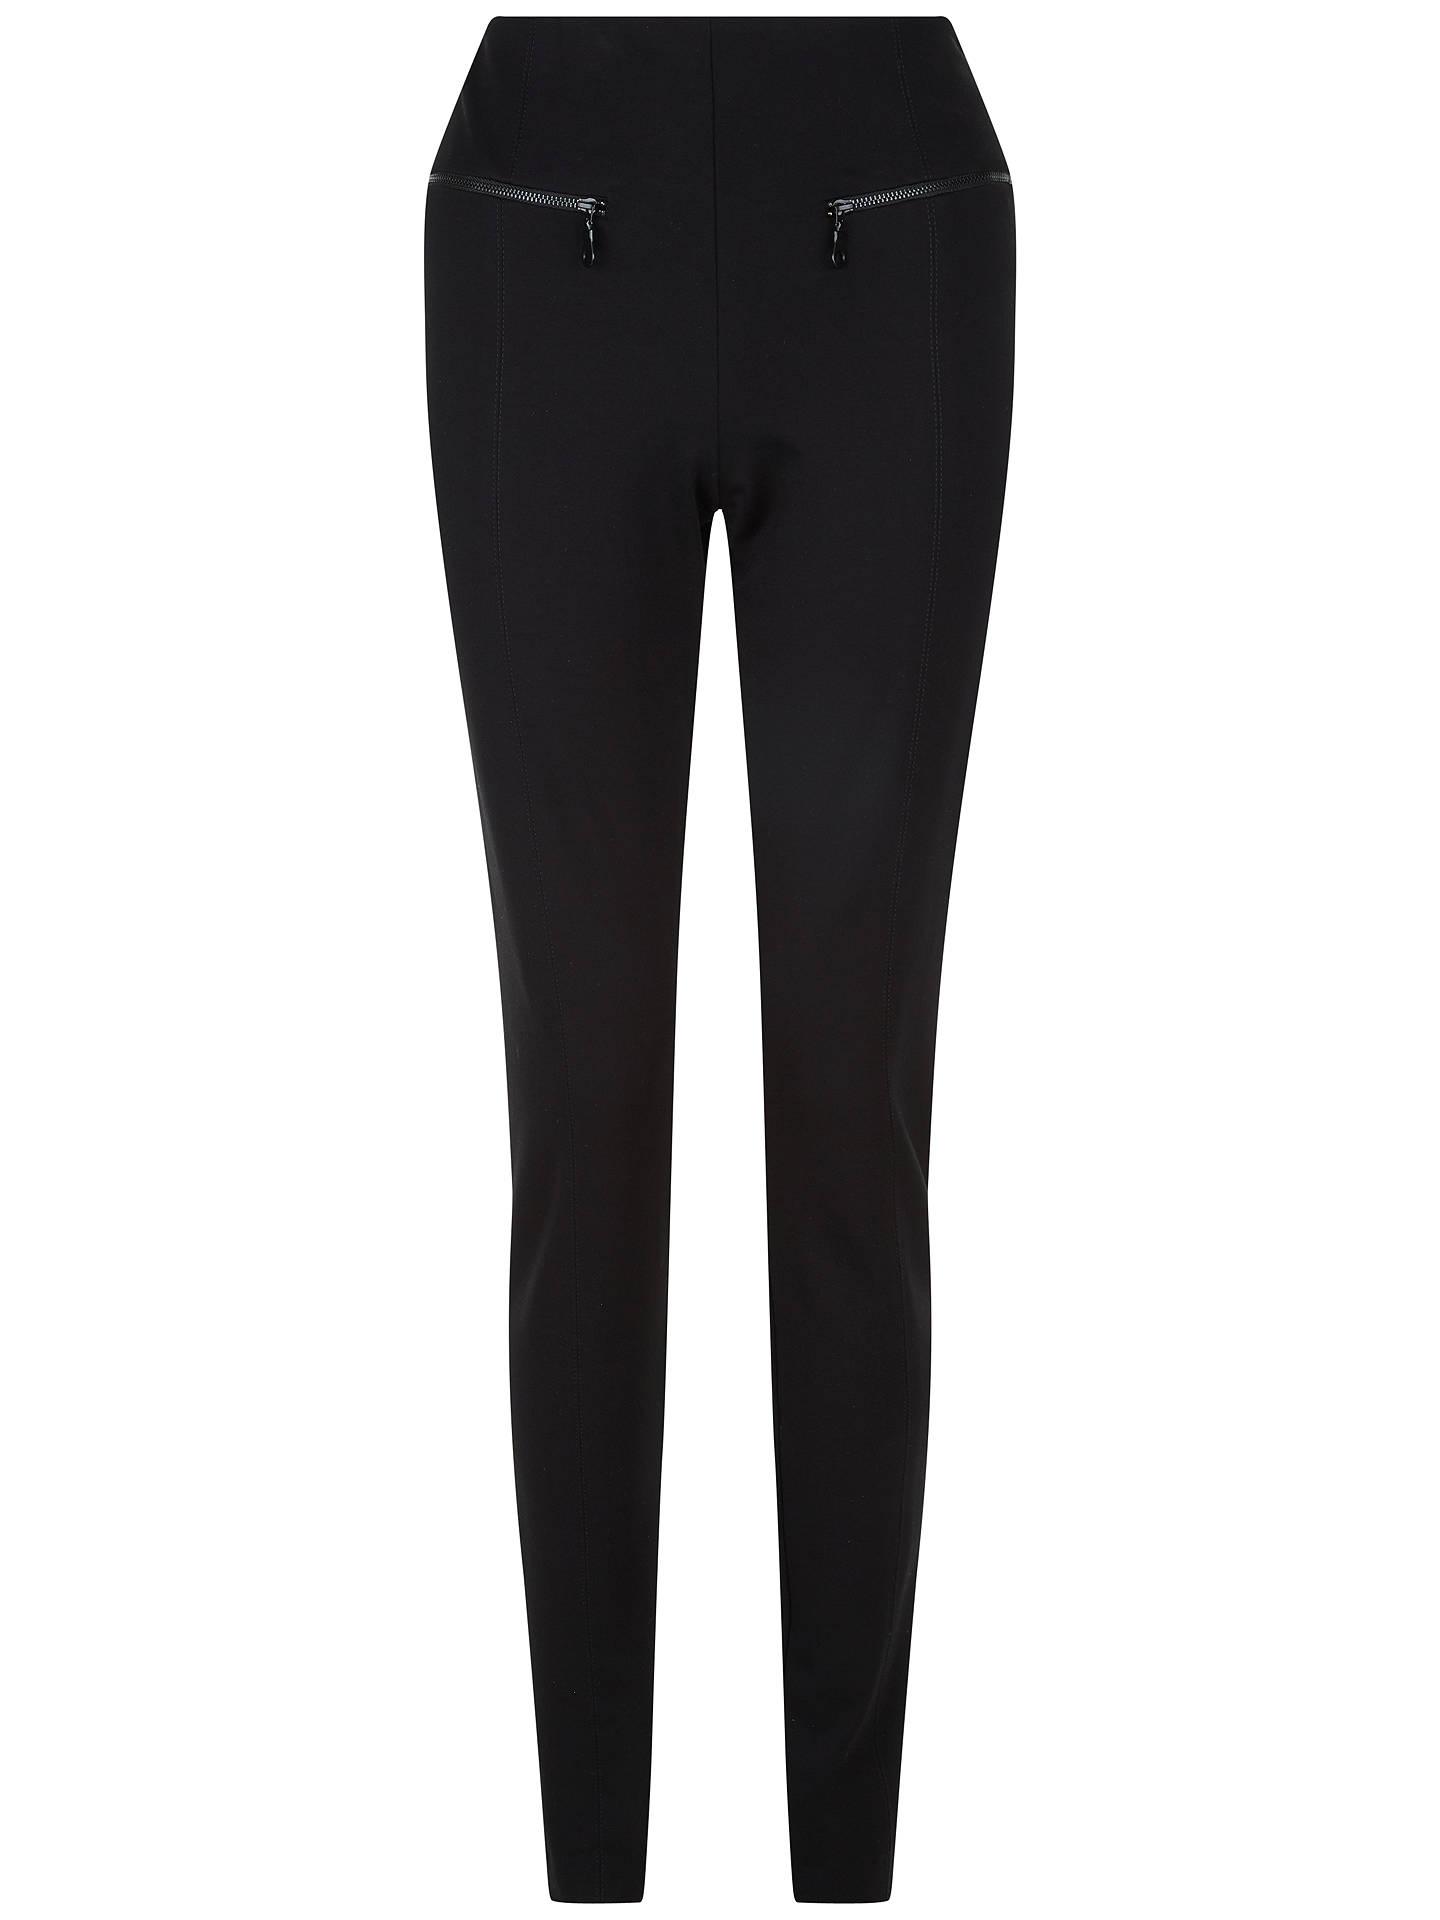 6e42496020b Buy Damsel in a dress Pascal Trousers